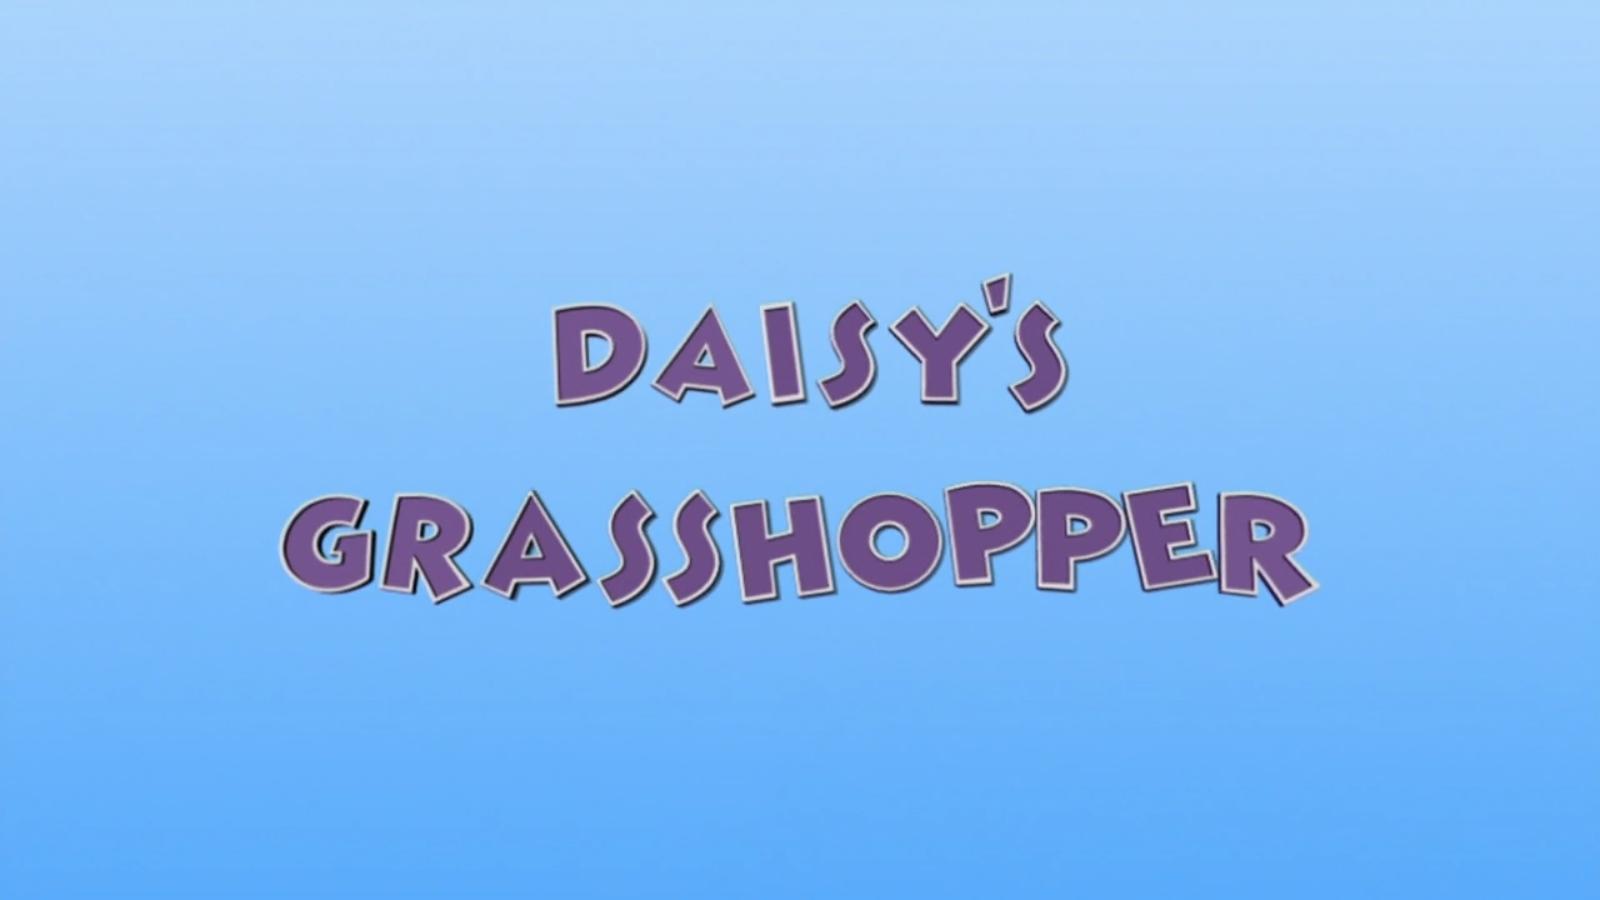 Daisy's Grasshopper